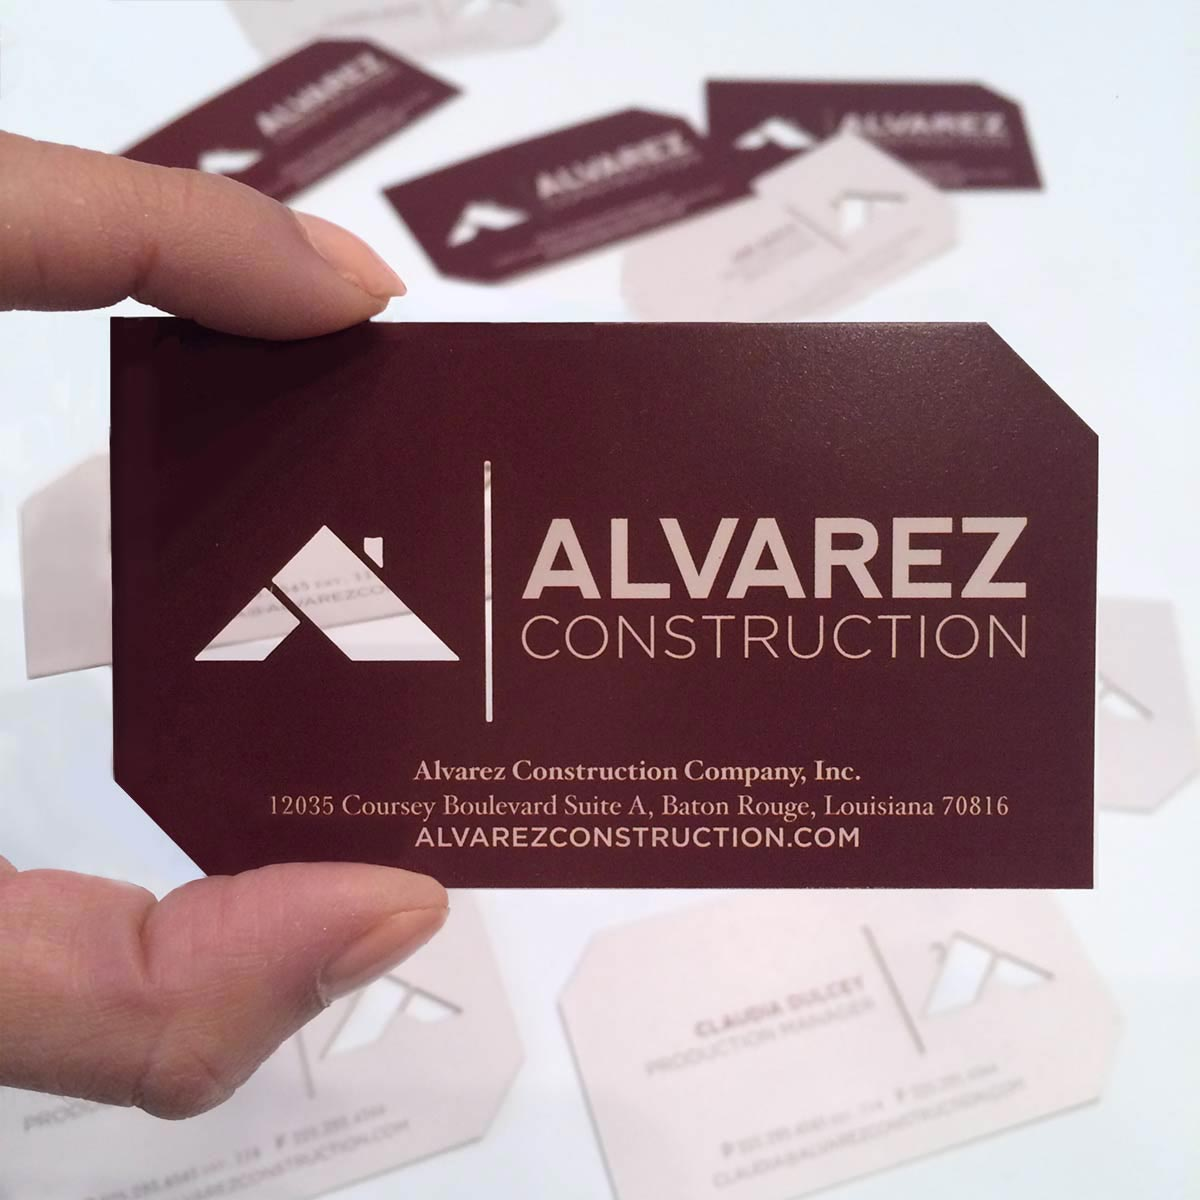 Constructing Brands: Alvarez Construction